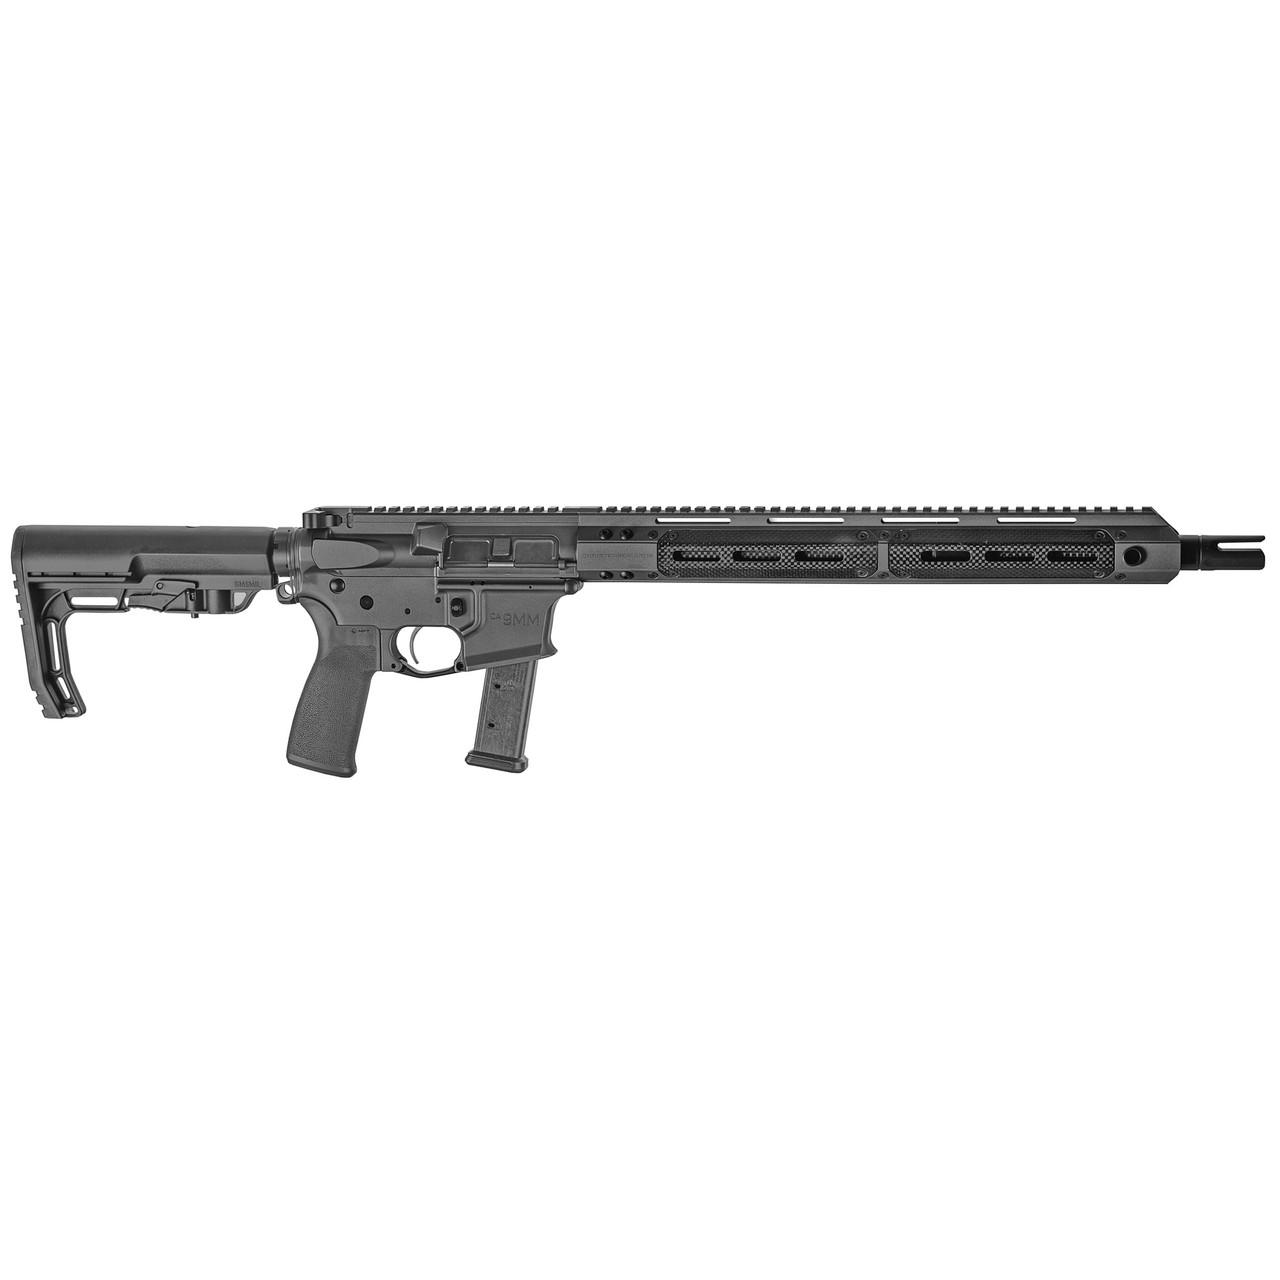 "Christensen Arms CA9mm 16"" M-Lok CALIFORNIA LEGAL - 9mm - Carbon Fiber"